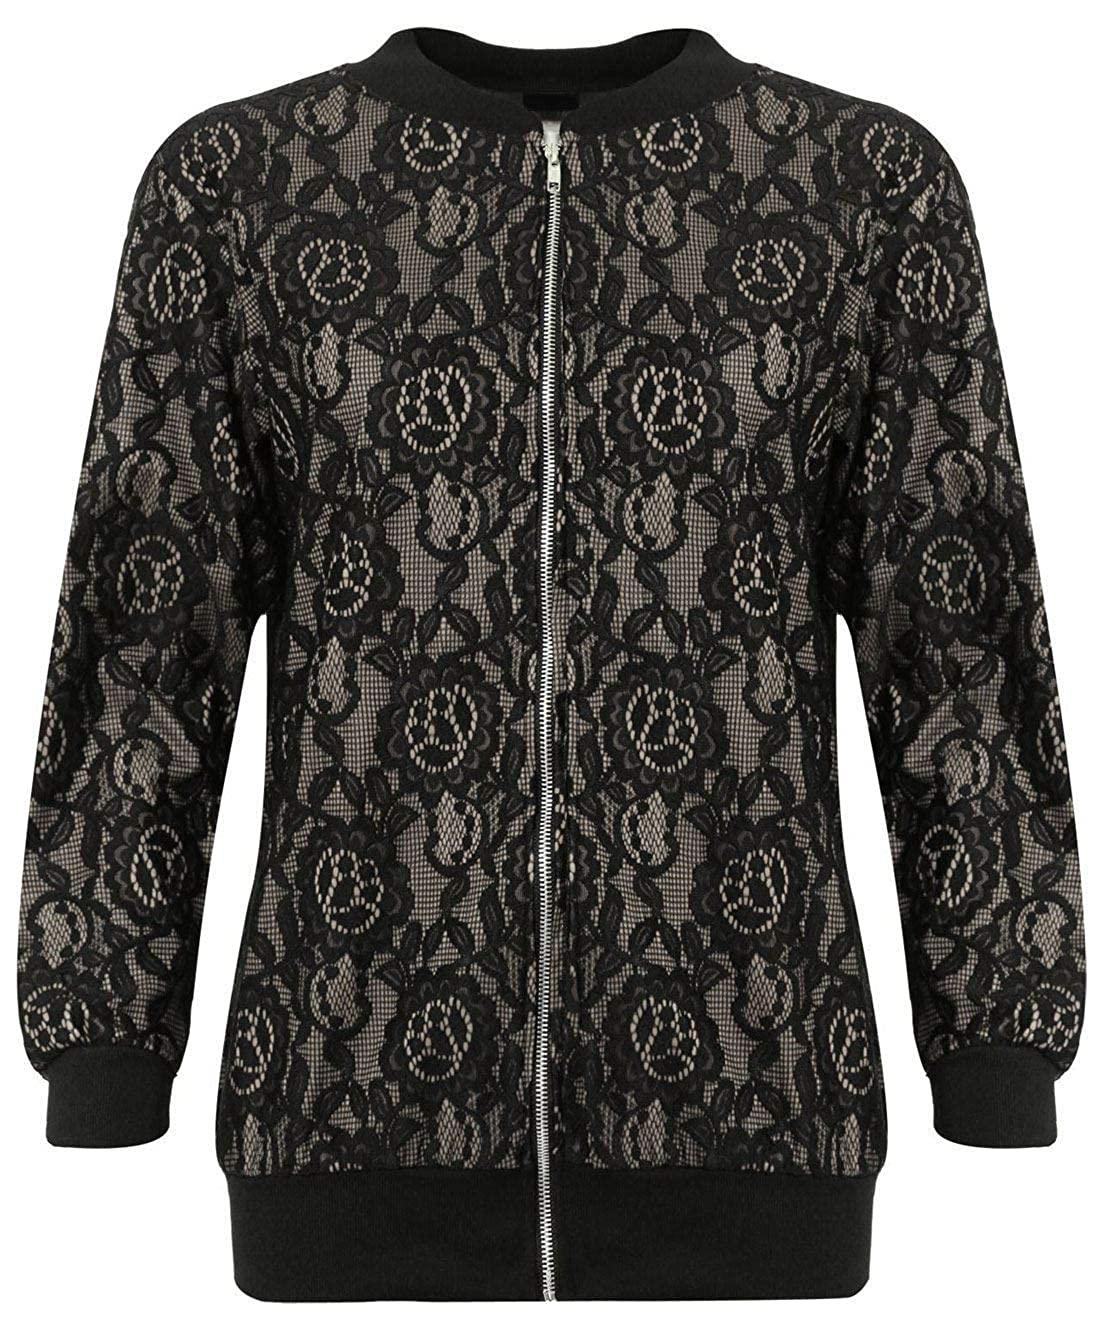 REAL LIFE FASHION LTD Womens Floral Lace Zip Up Elasticated Bomber Jacket Ladies Long Sleeve Jacket